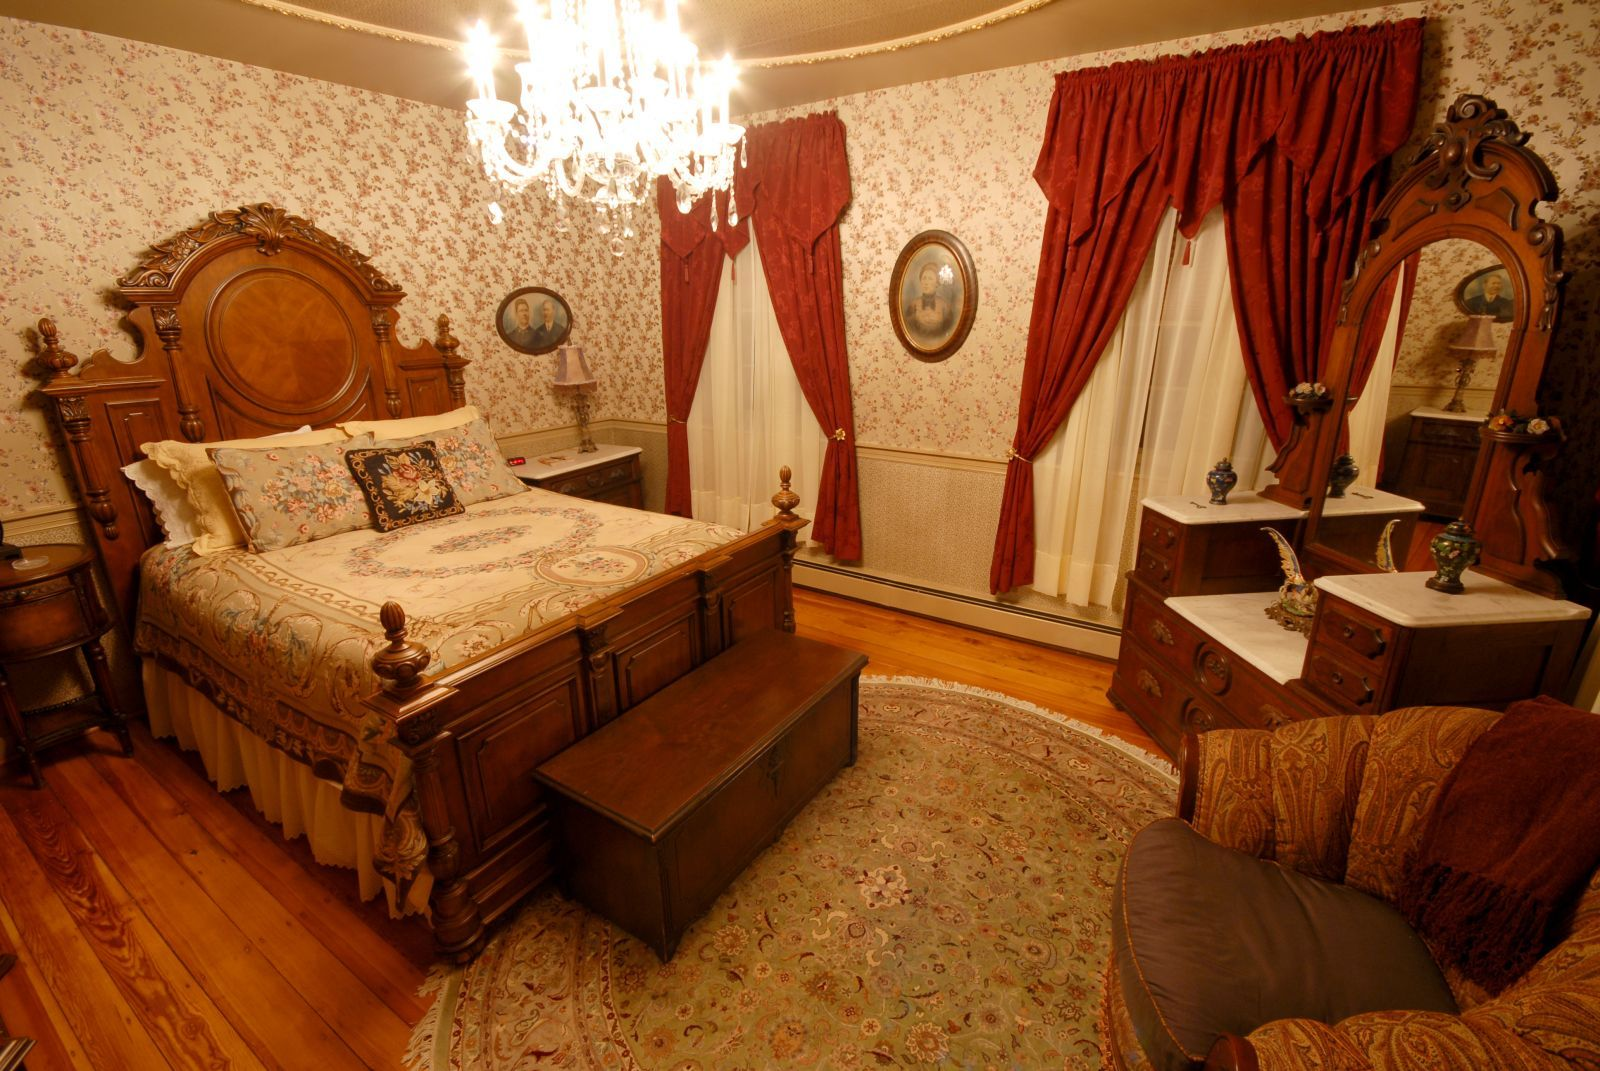 Victorian Style Bedroom Ideas Victorian Bedroom Victorian Bedroom Decor Victorian Home Decor